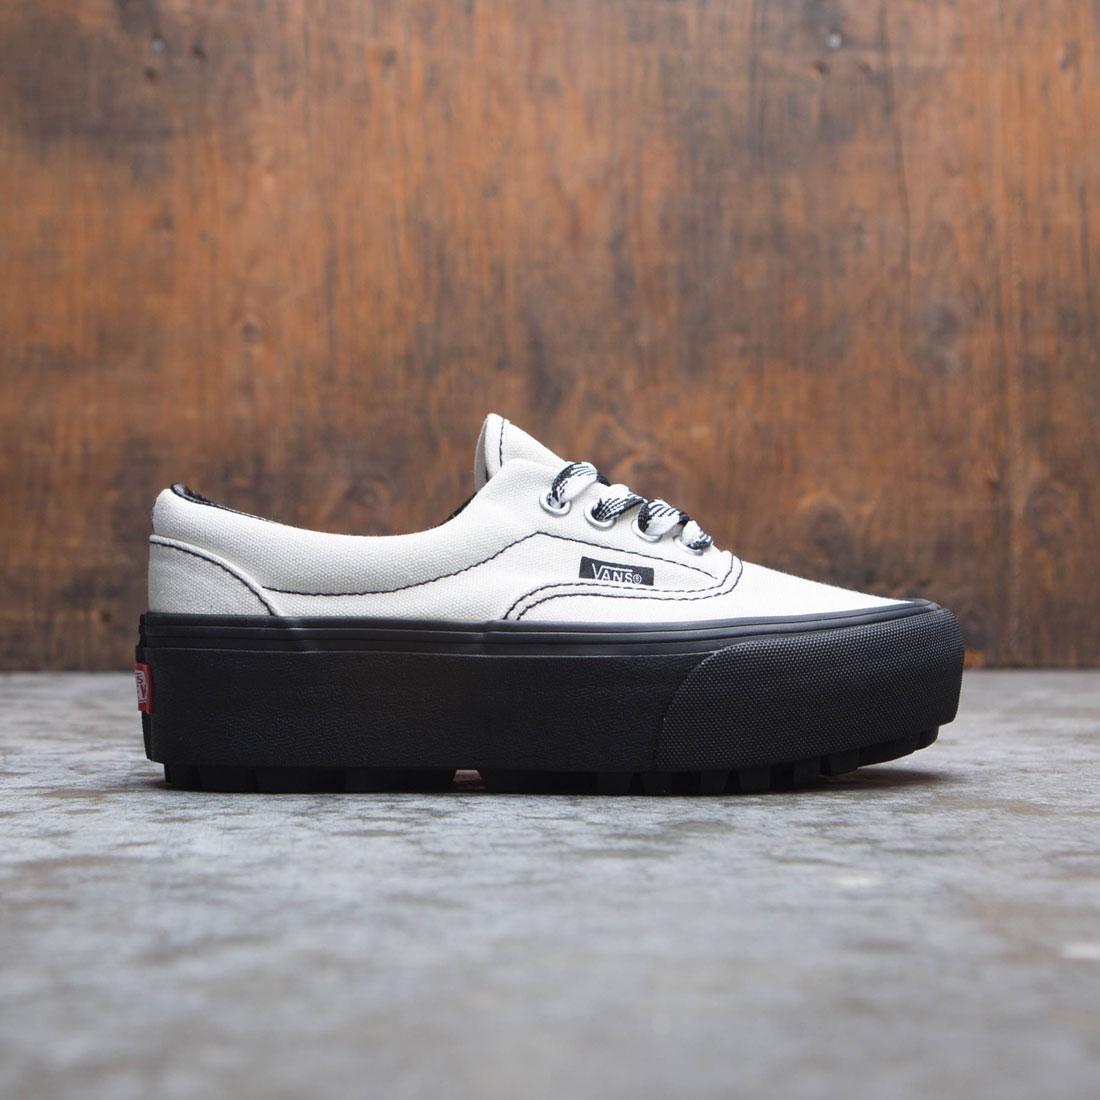 6e29308dee Vans Women Era Lug Platform - 90s Retro white black